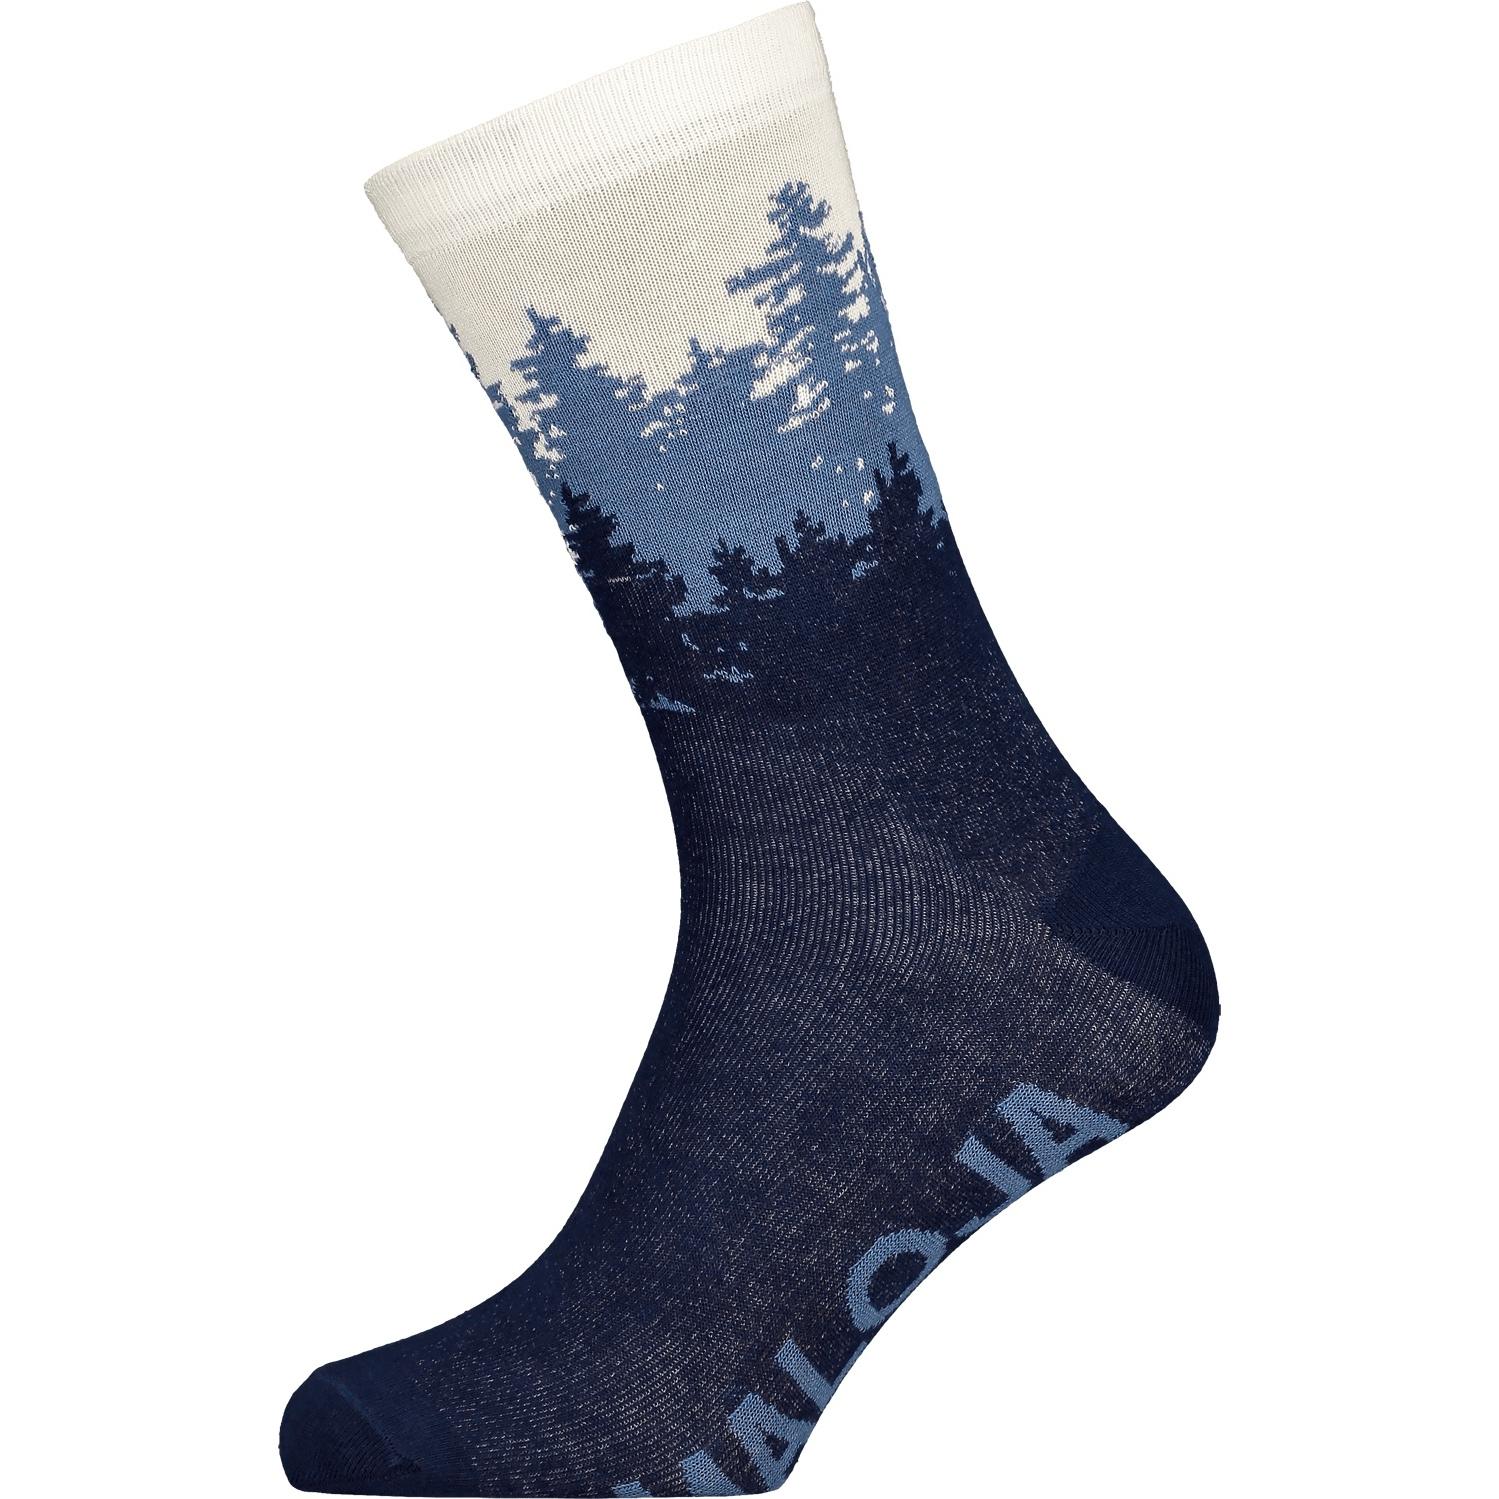 Maloja GartenbaumläuferM. Socks - night sky 8325